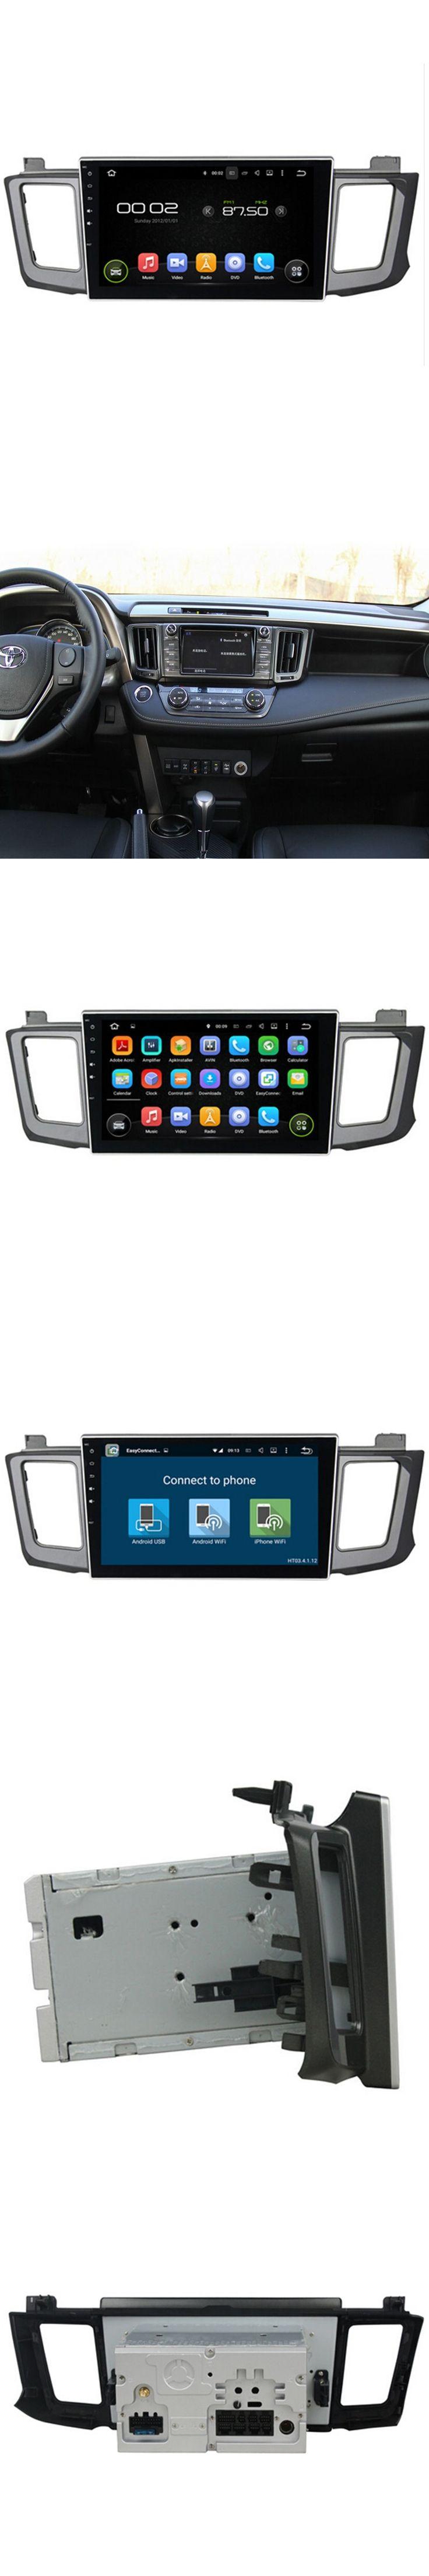 For 1024*600 Android 5.1.1 Quad Core 16GB Car Radio For Toyota RAV4 2012-2015 DVD Navigation Steering wheel control OBD wifi USB